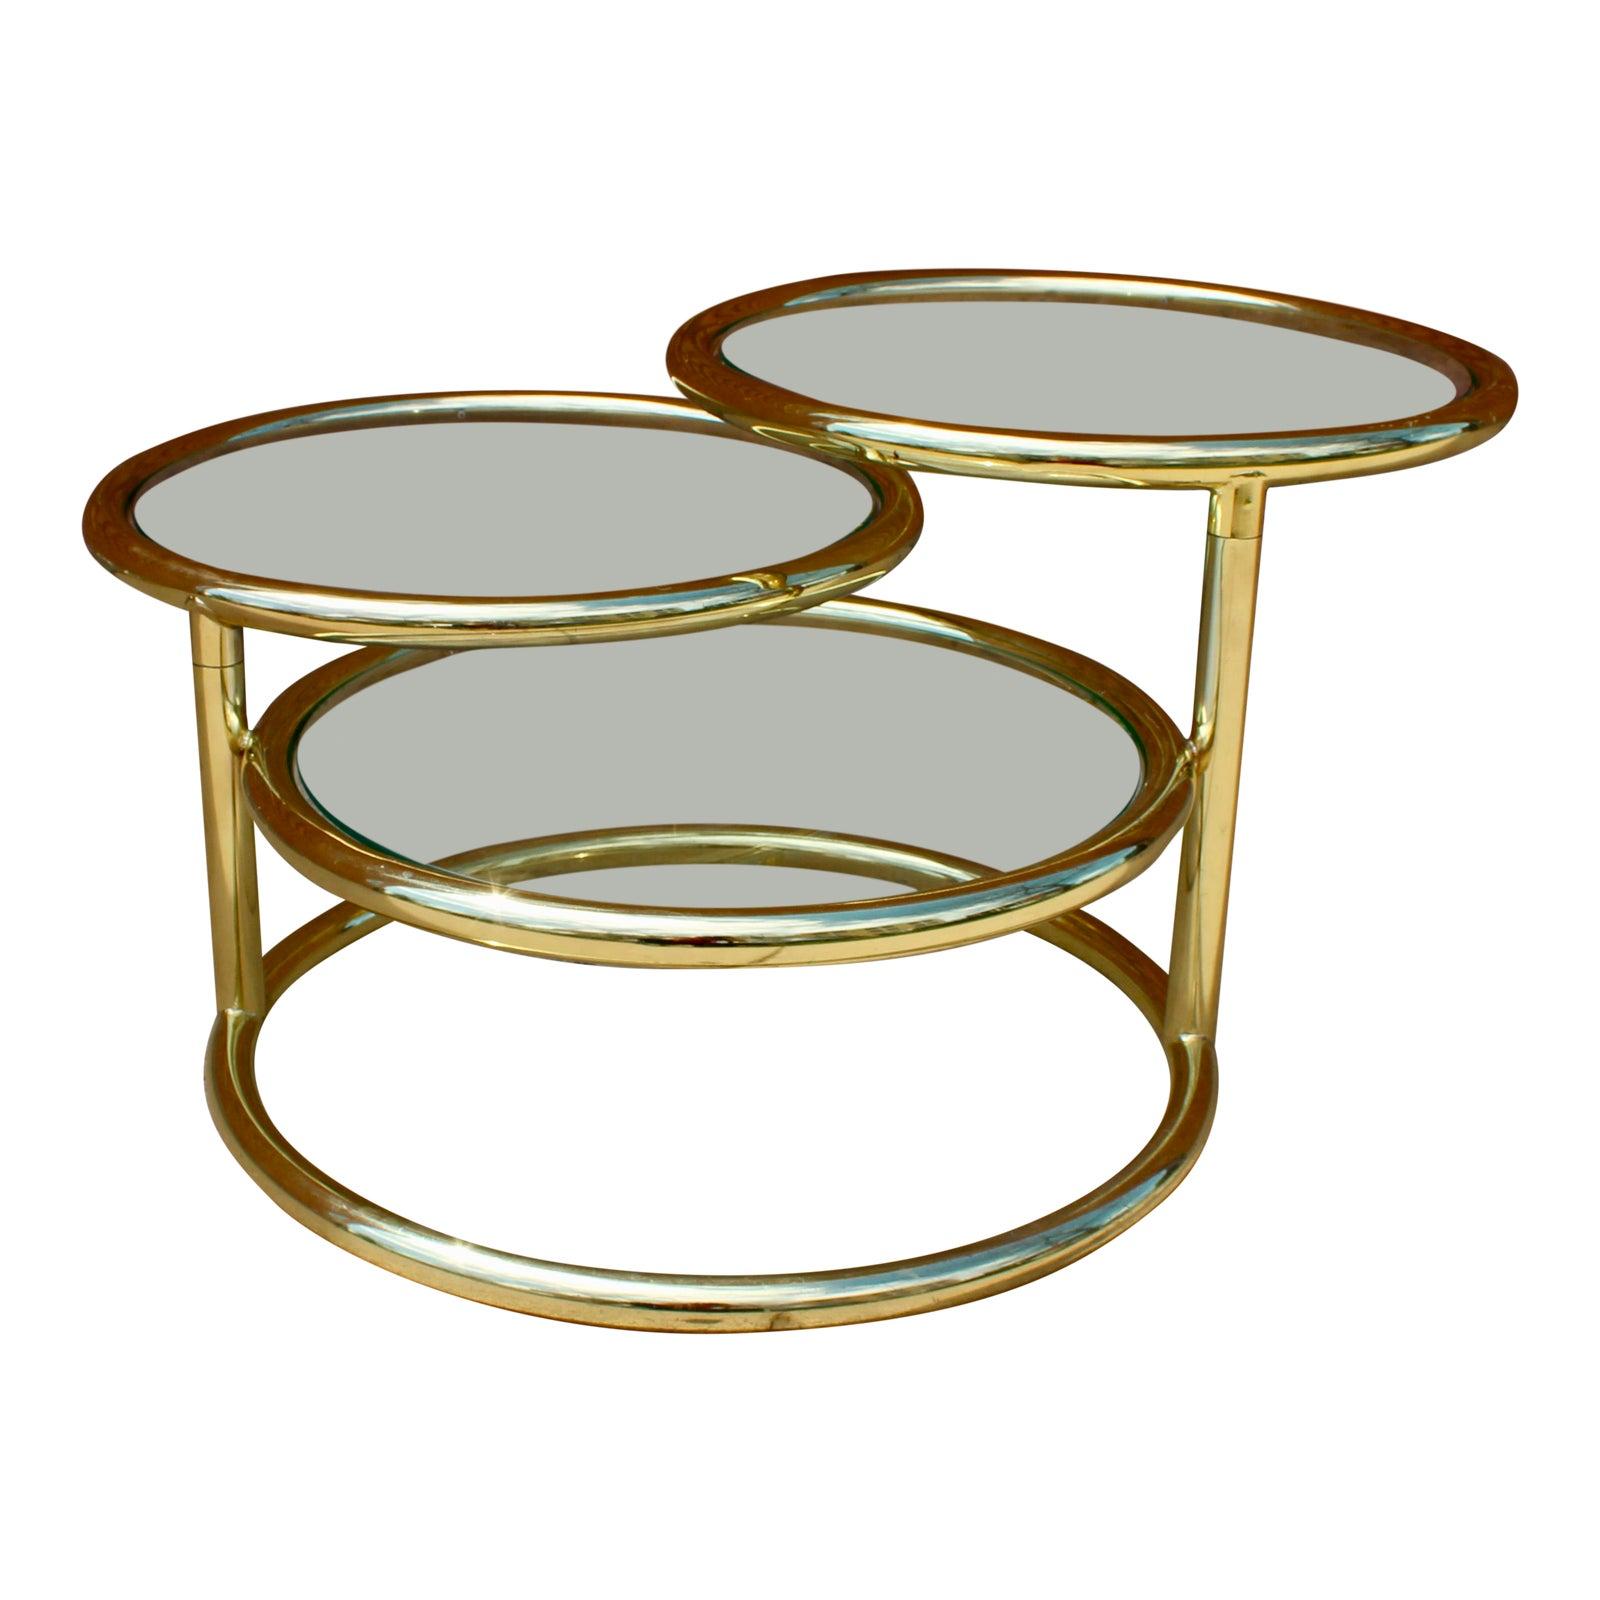 Mid Century Round Gold Metal Swivel Coffee Table Chairish